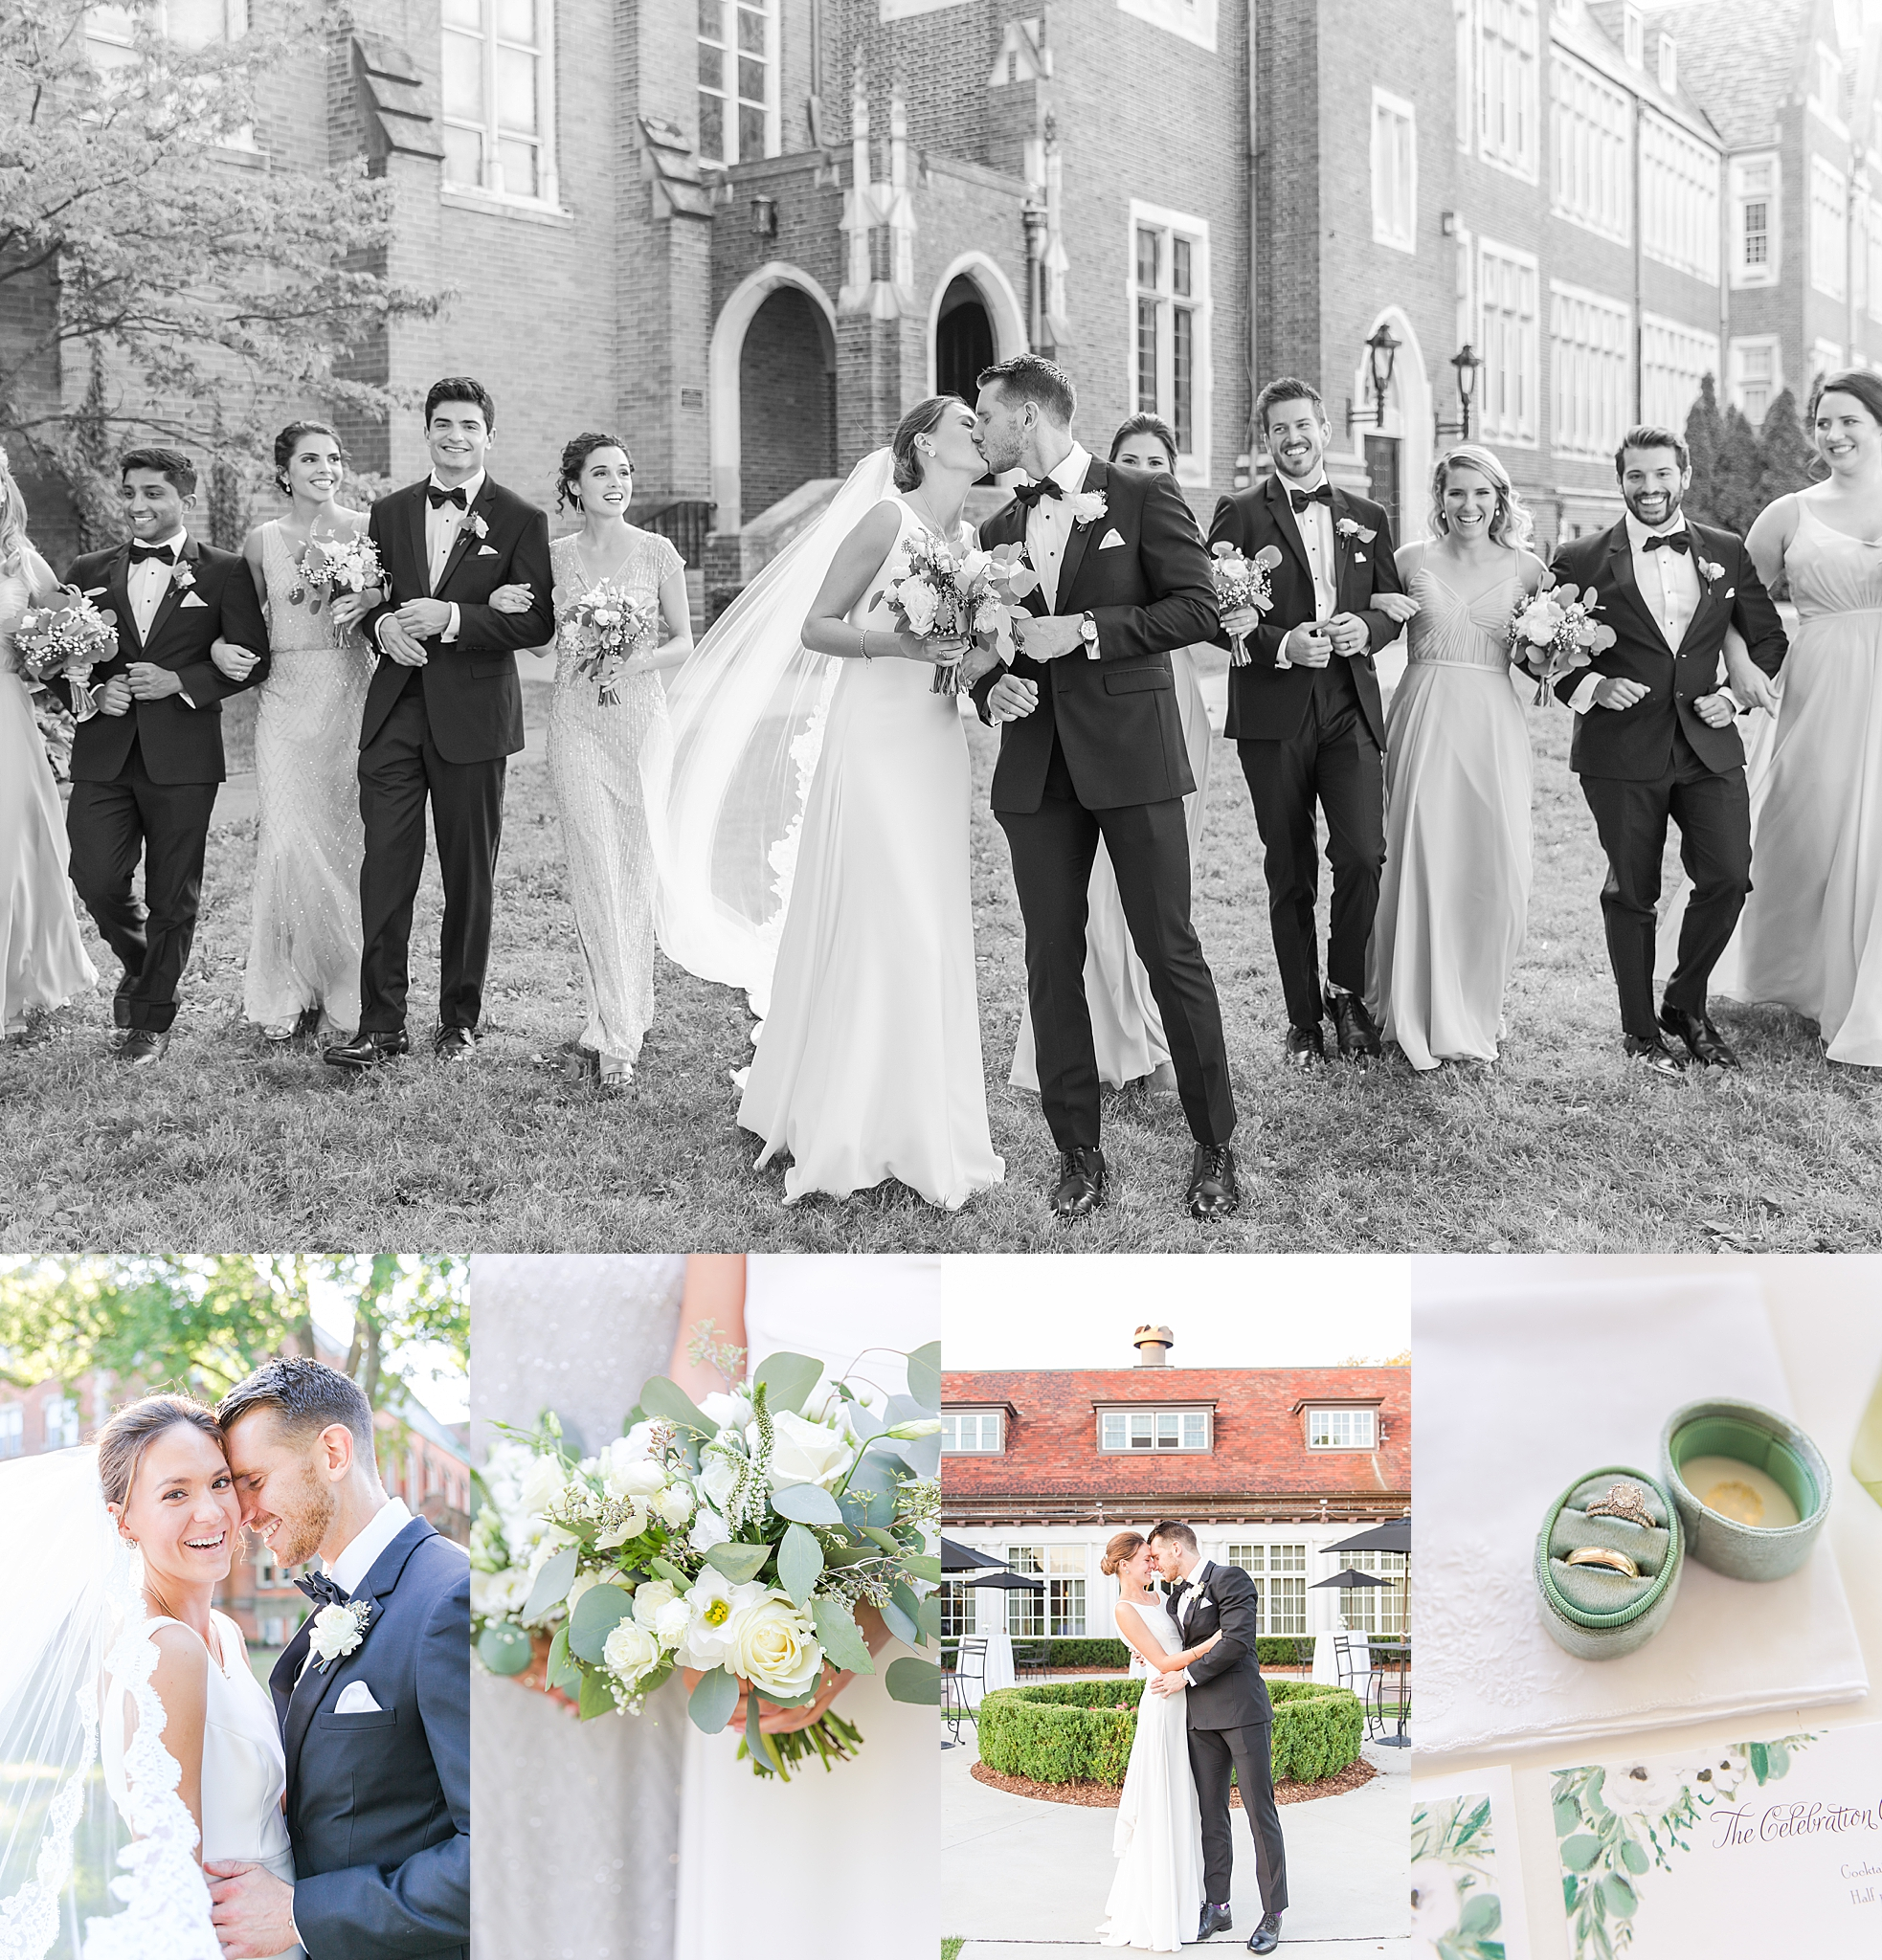 detroit-wedding-photographer-grosse-pointe-academy-chapel-detroit-golf-club-wedding-carly-matt-by-courtney-carolyn-photography_0131.jpg